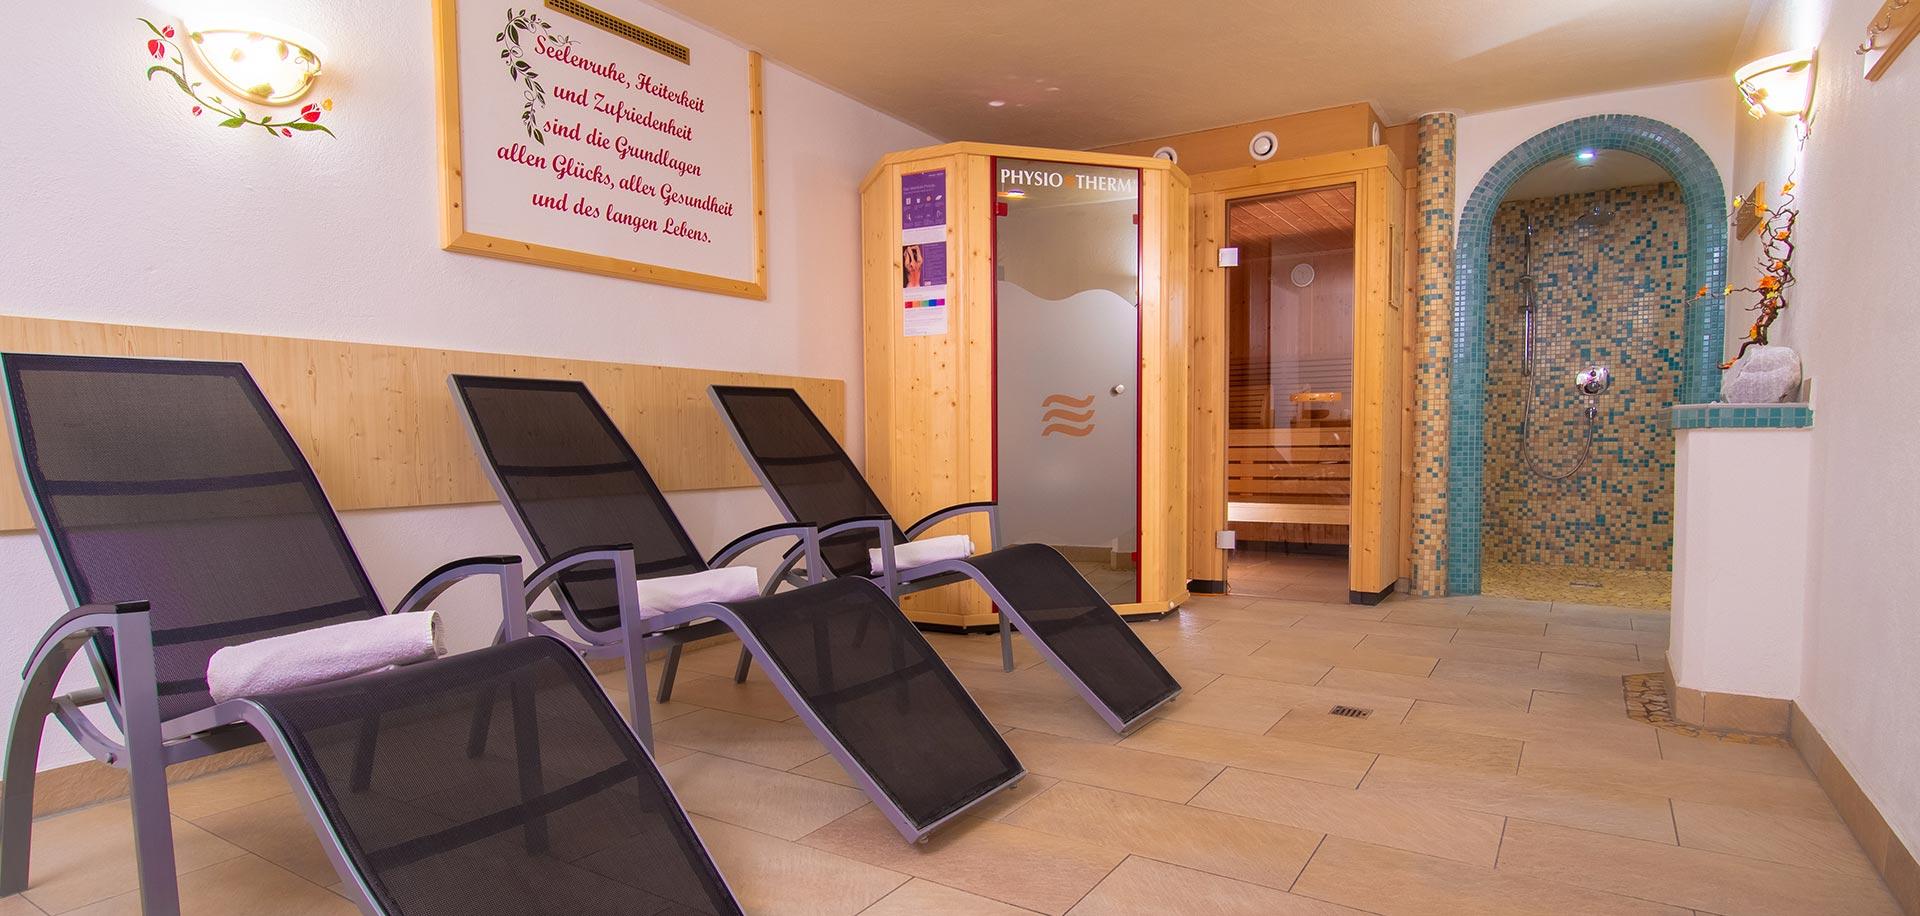 Wellnessraum - Apartments - Zimmer - Pension am Rain - Stubai